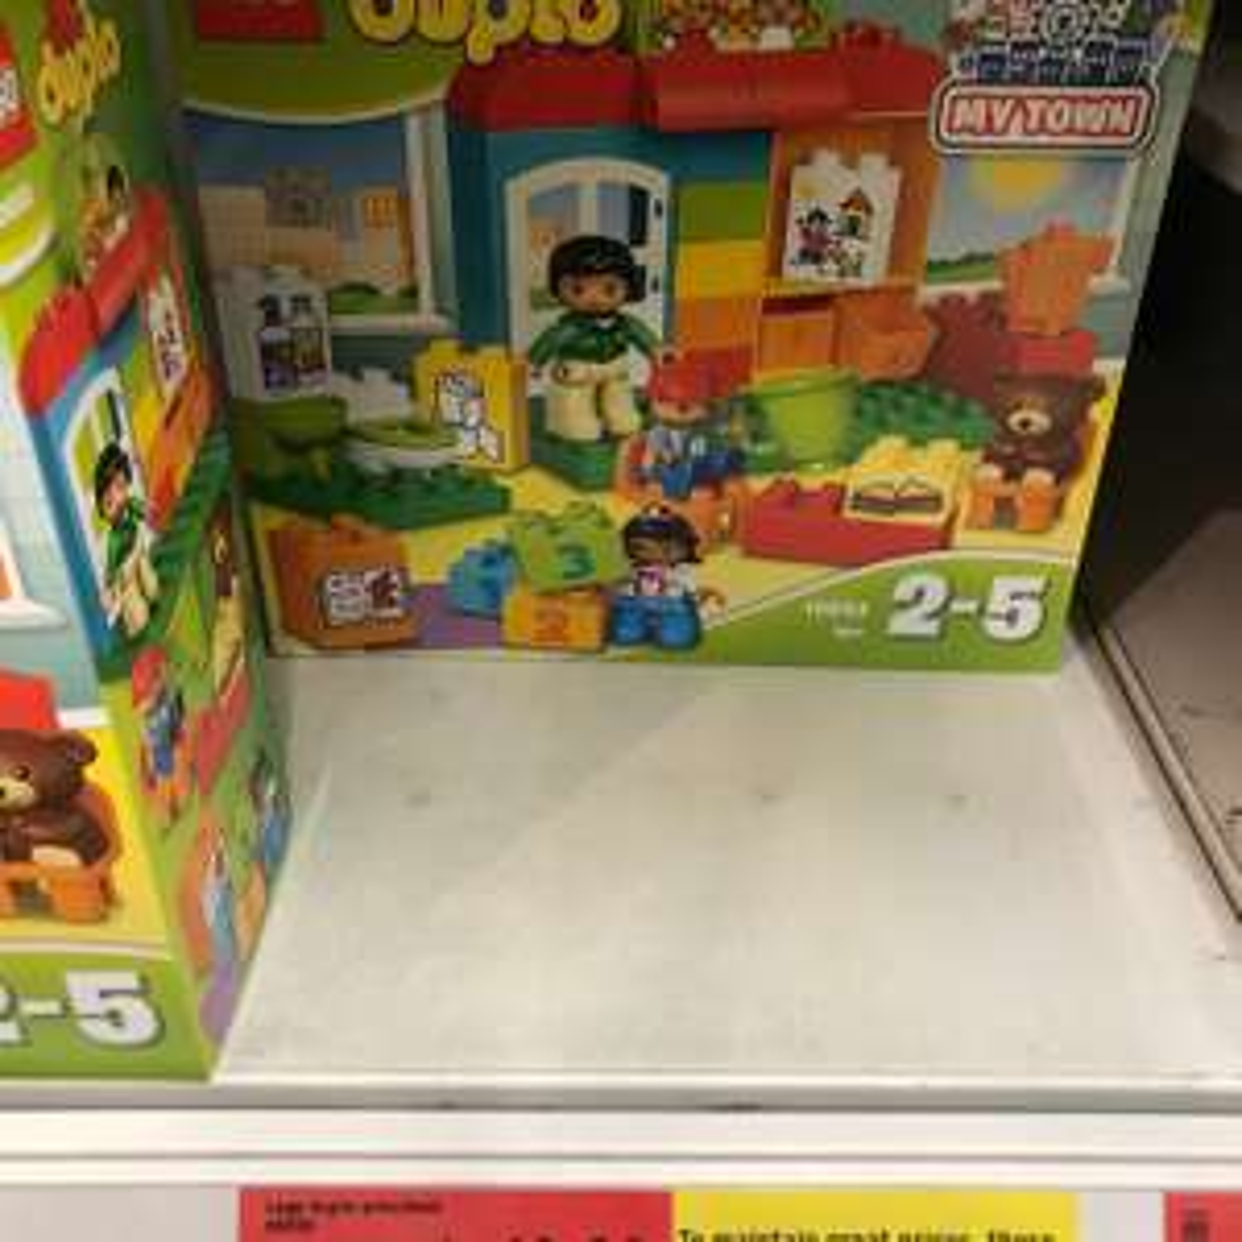 Lego duplo pre school £10.66 @ Sainsbury's instore